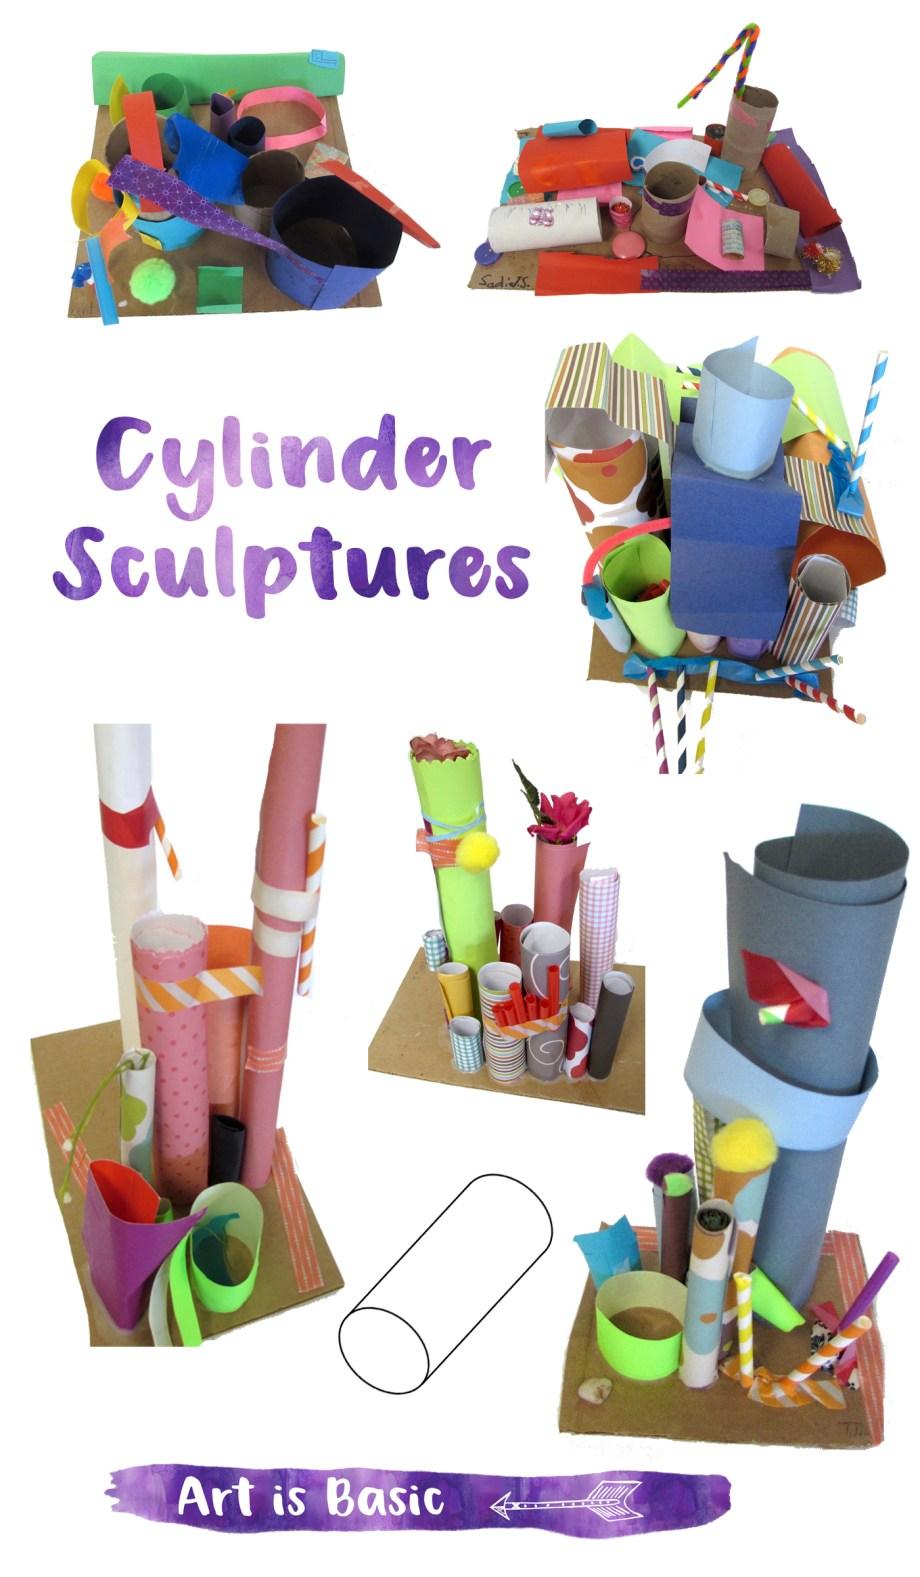 Cylinder Sculptures2